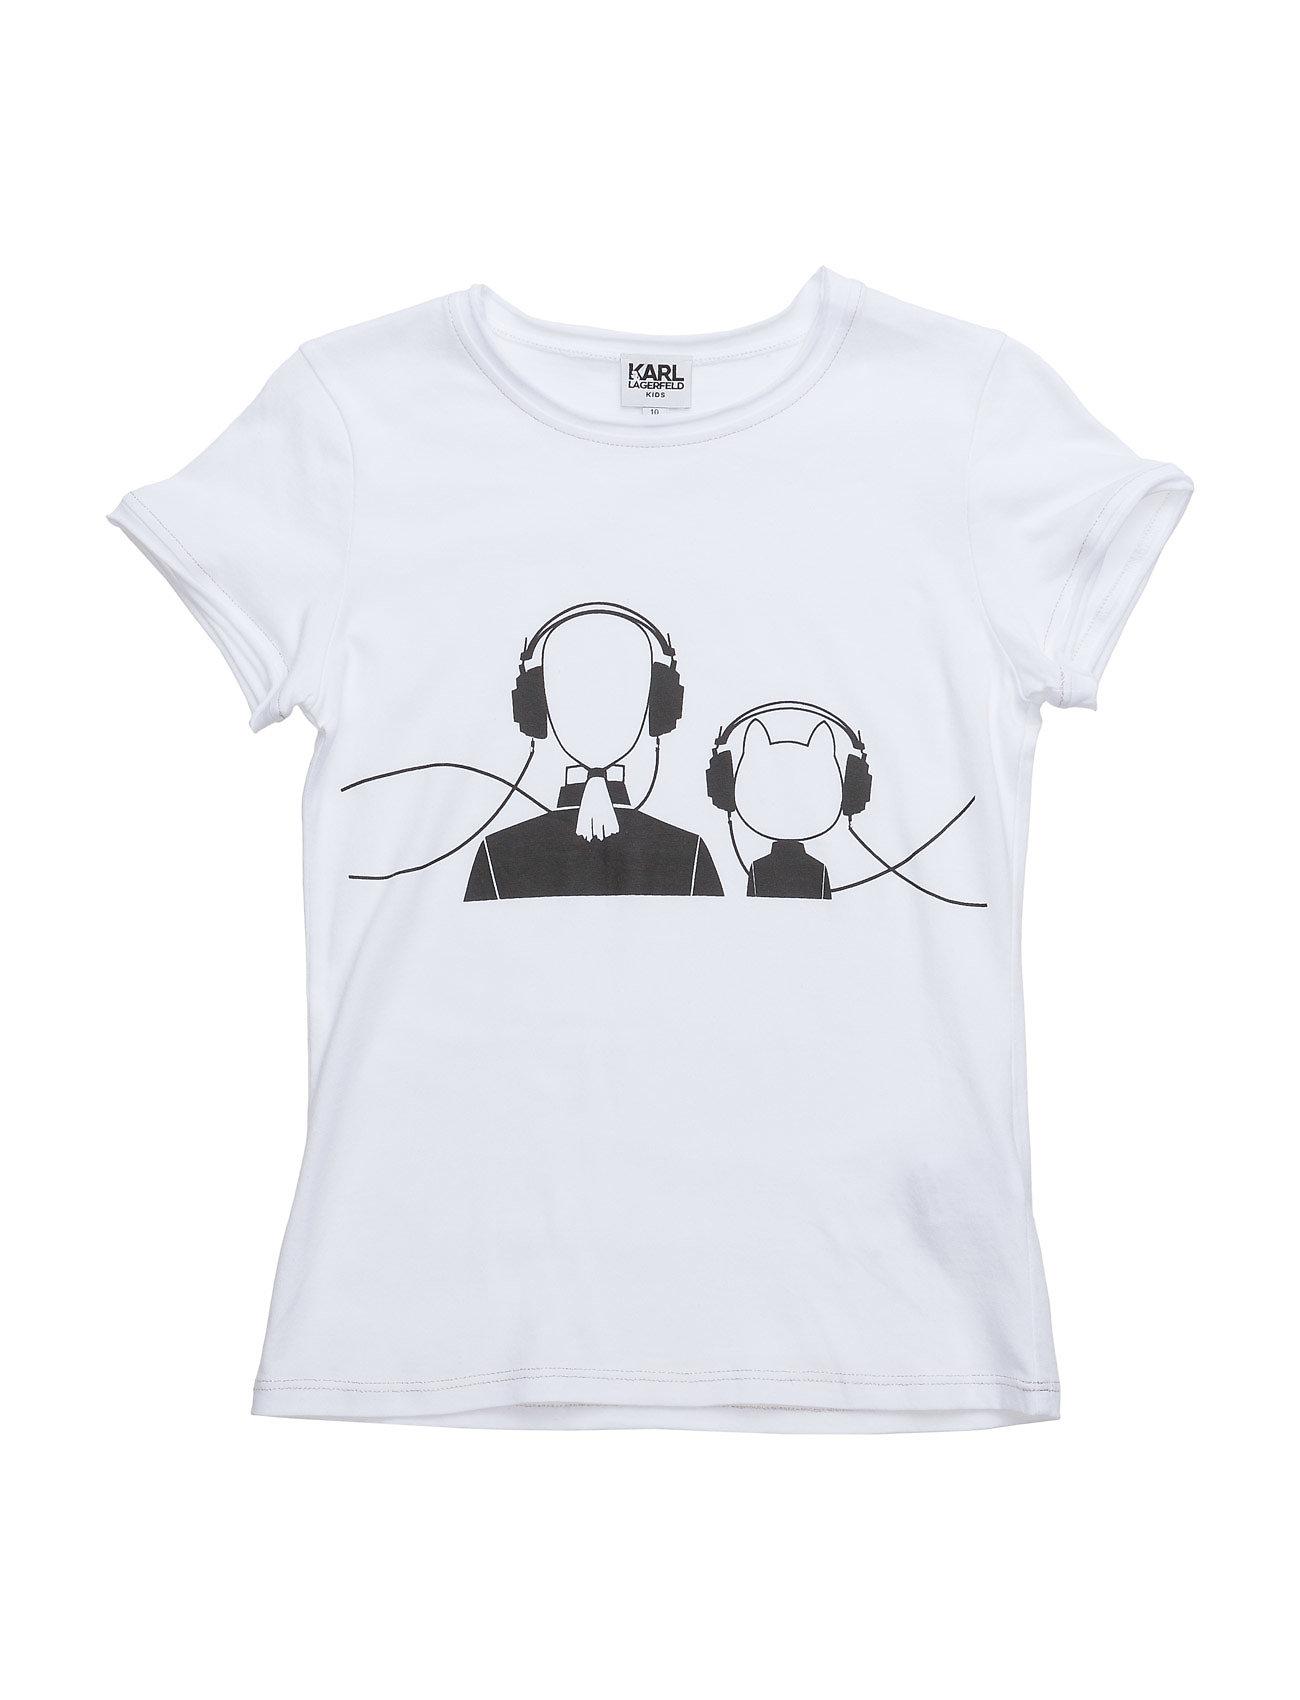 karl lagerfeld – T-shirt på boozt.com dk